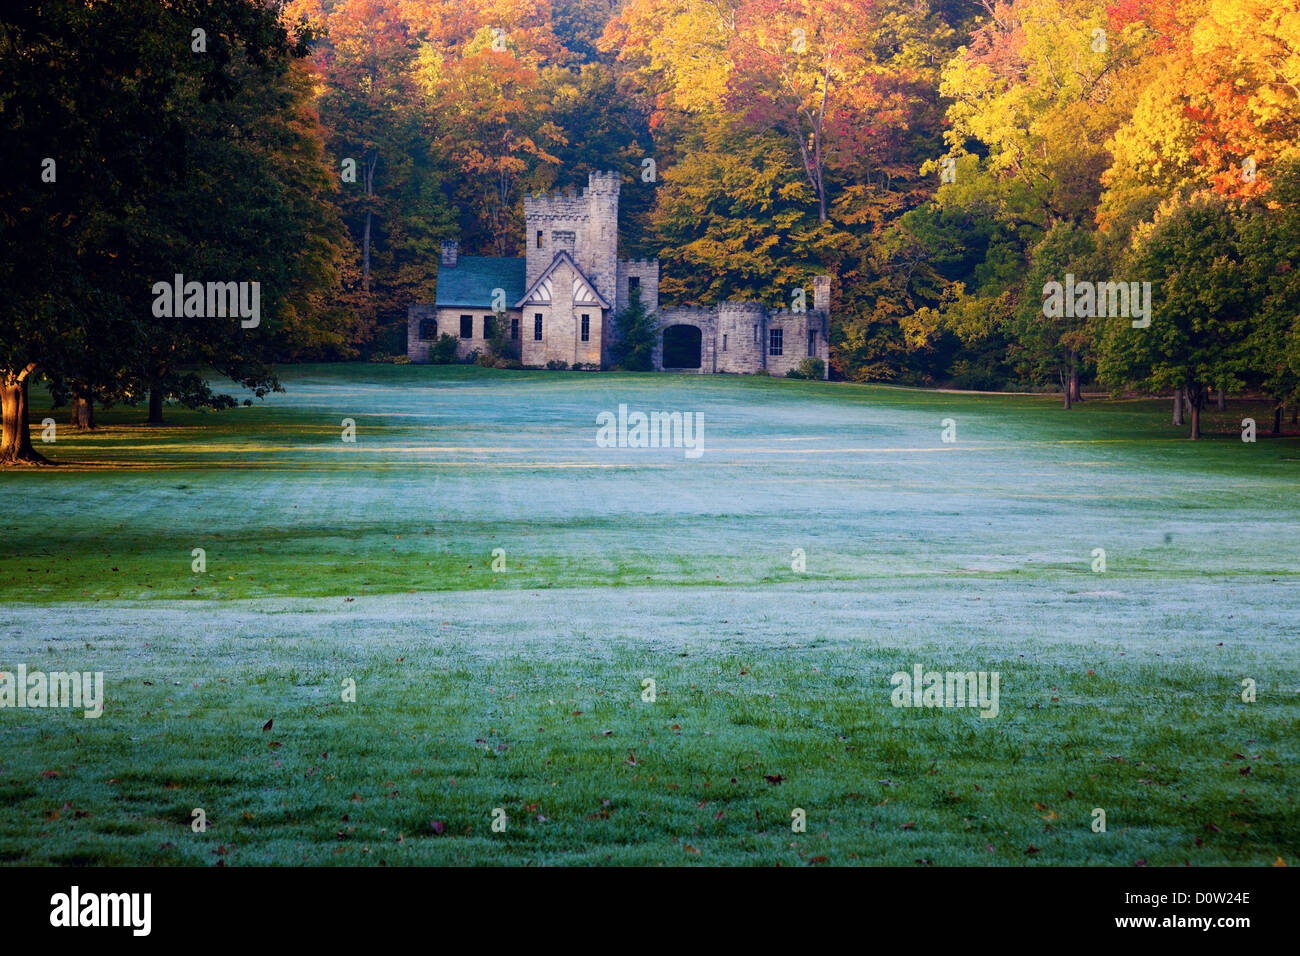 Cleveland Ohio Squires Castle Stock Photos & Cleveland Ohio